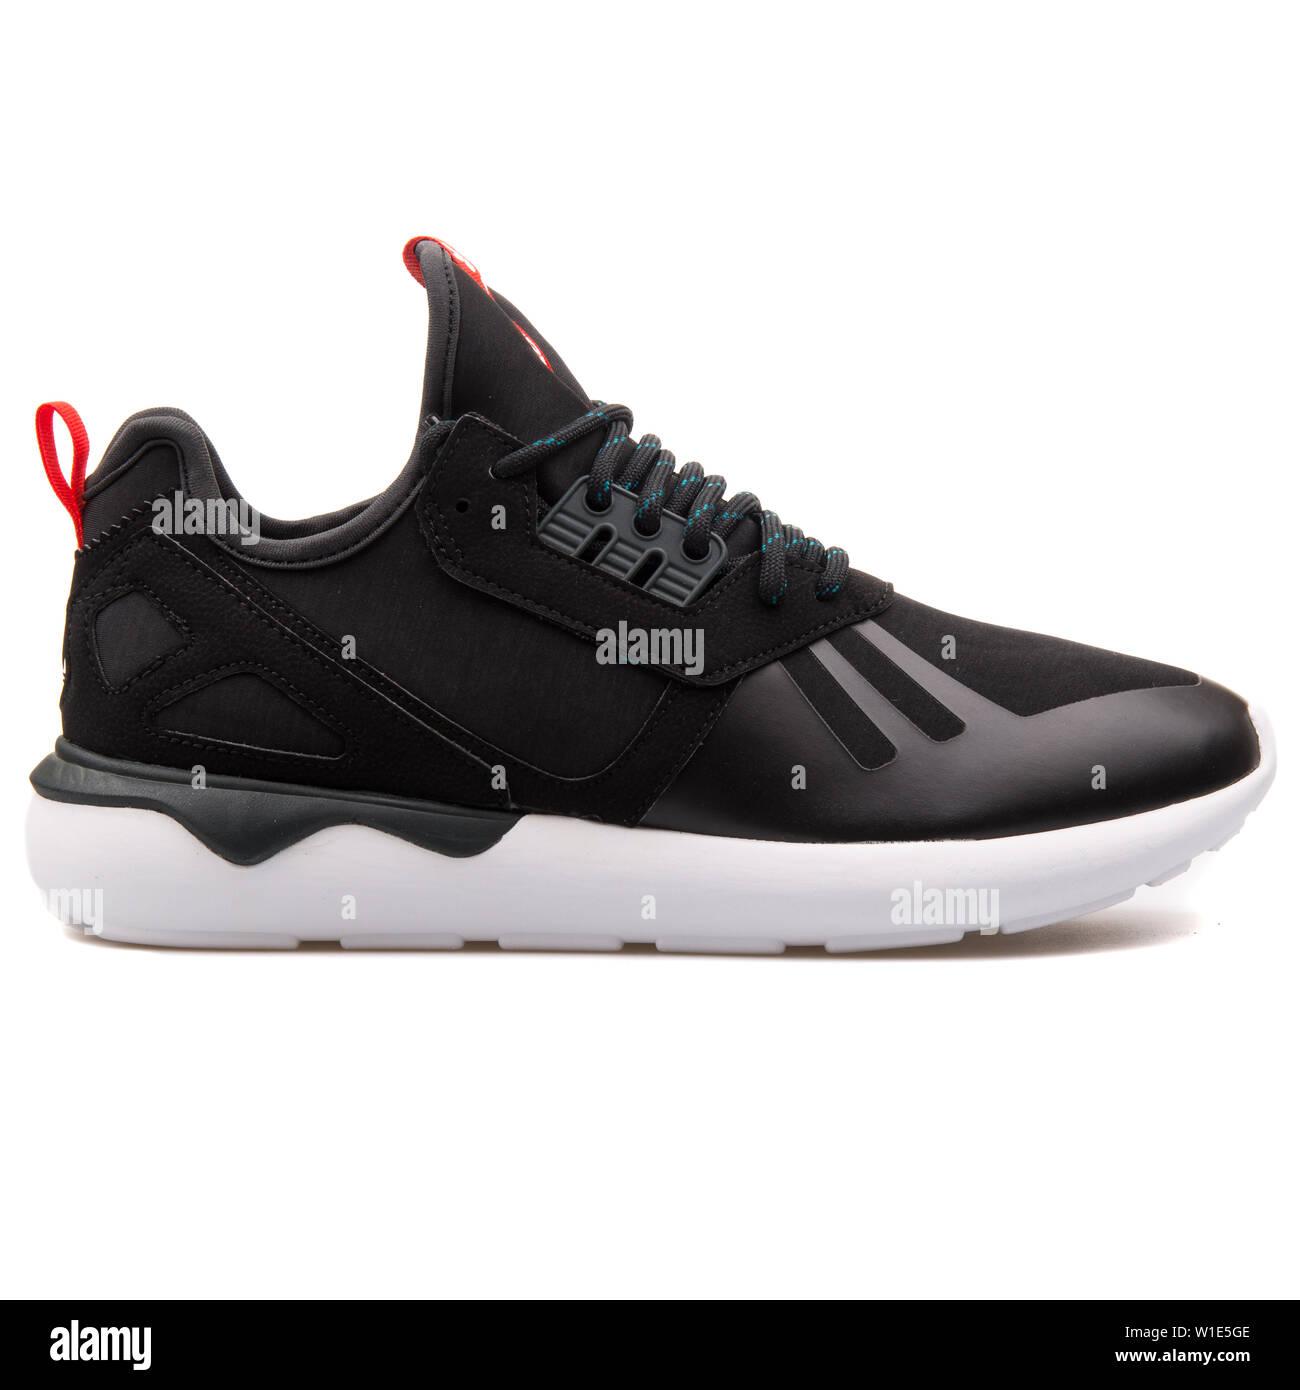 VIENNA, AUSTRIA - AUGUST 25, 2017: Adidas Tubular Runner Weave black and white sneaker on white background. Stock Photo